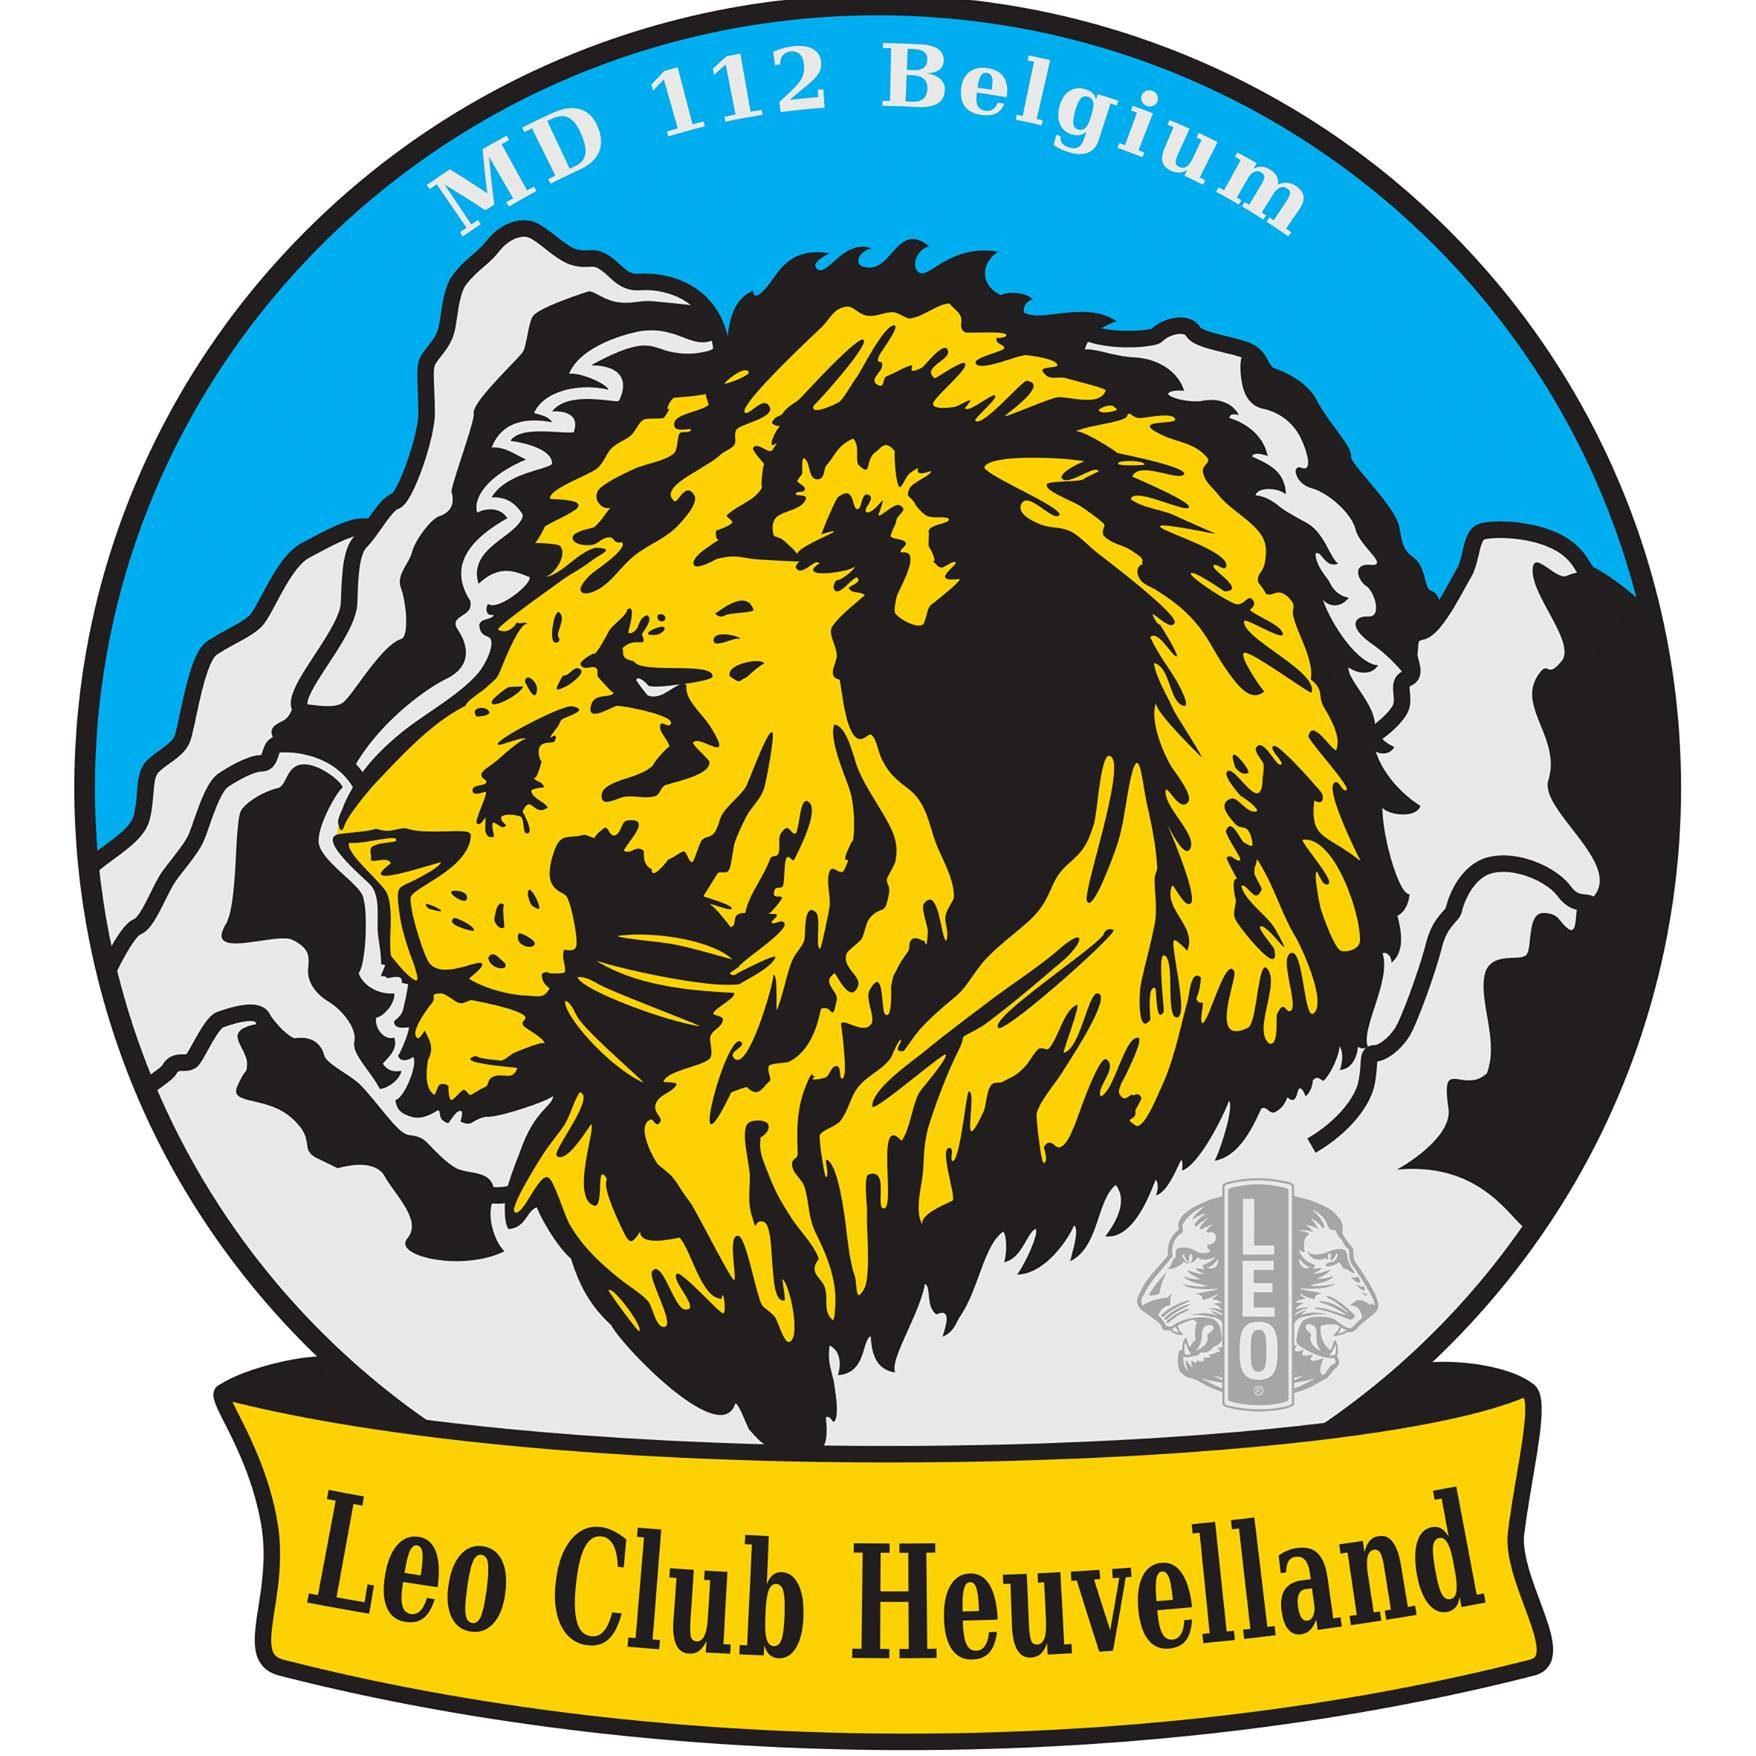 LEO Club Heuvelland